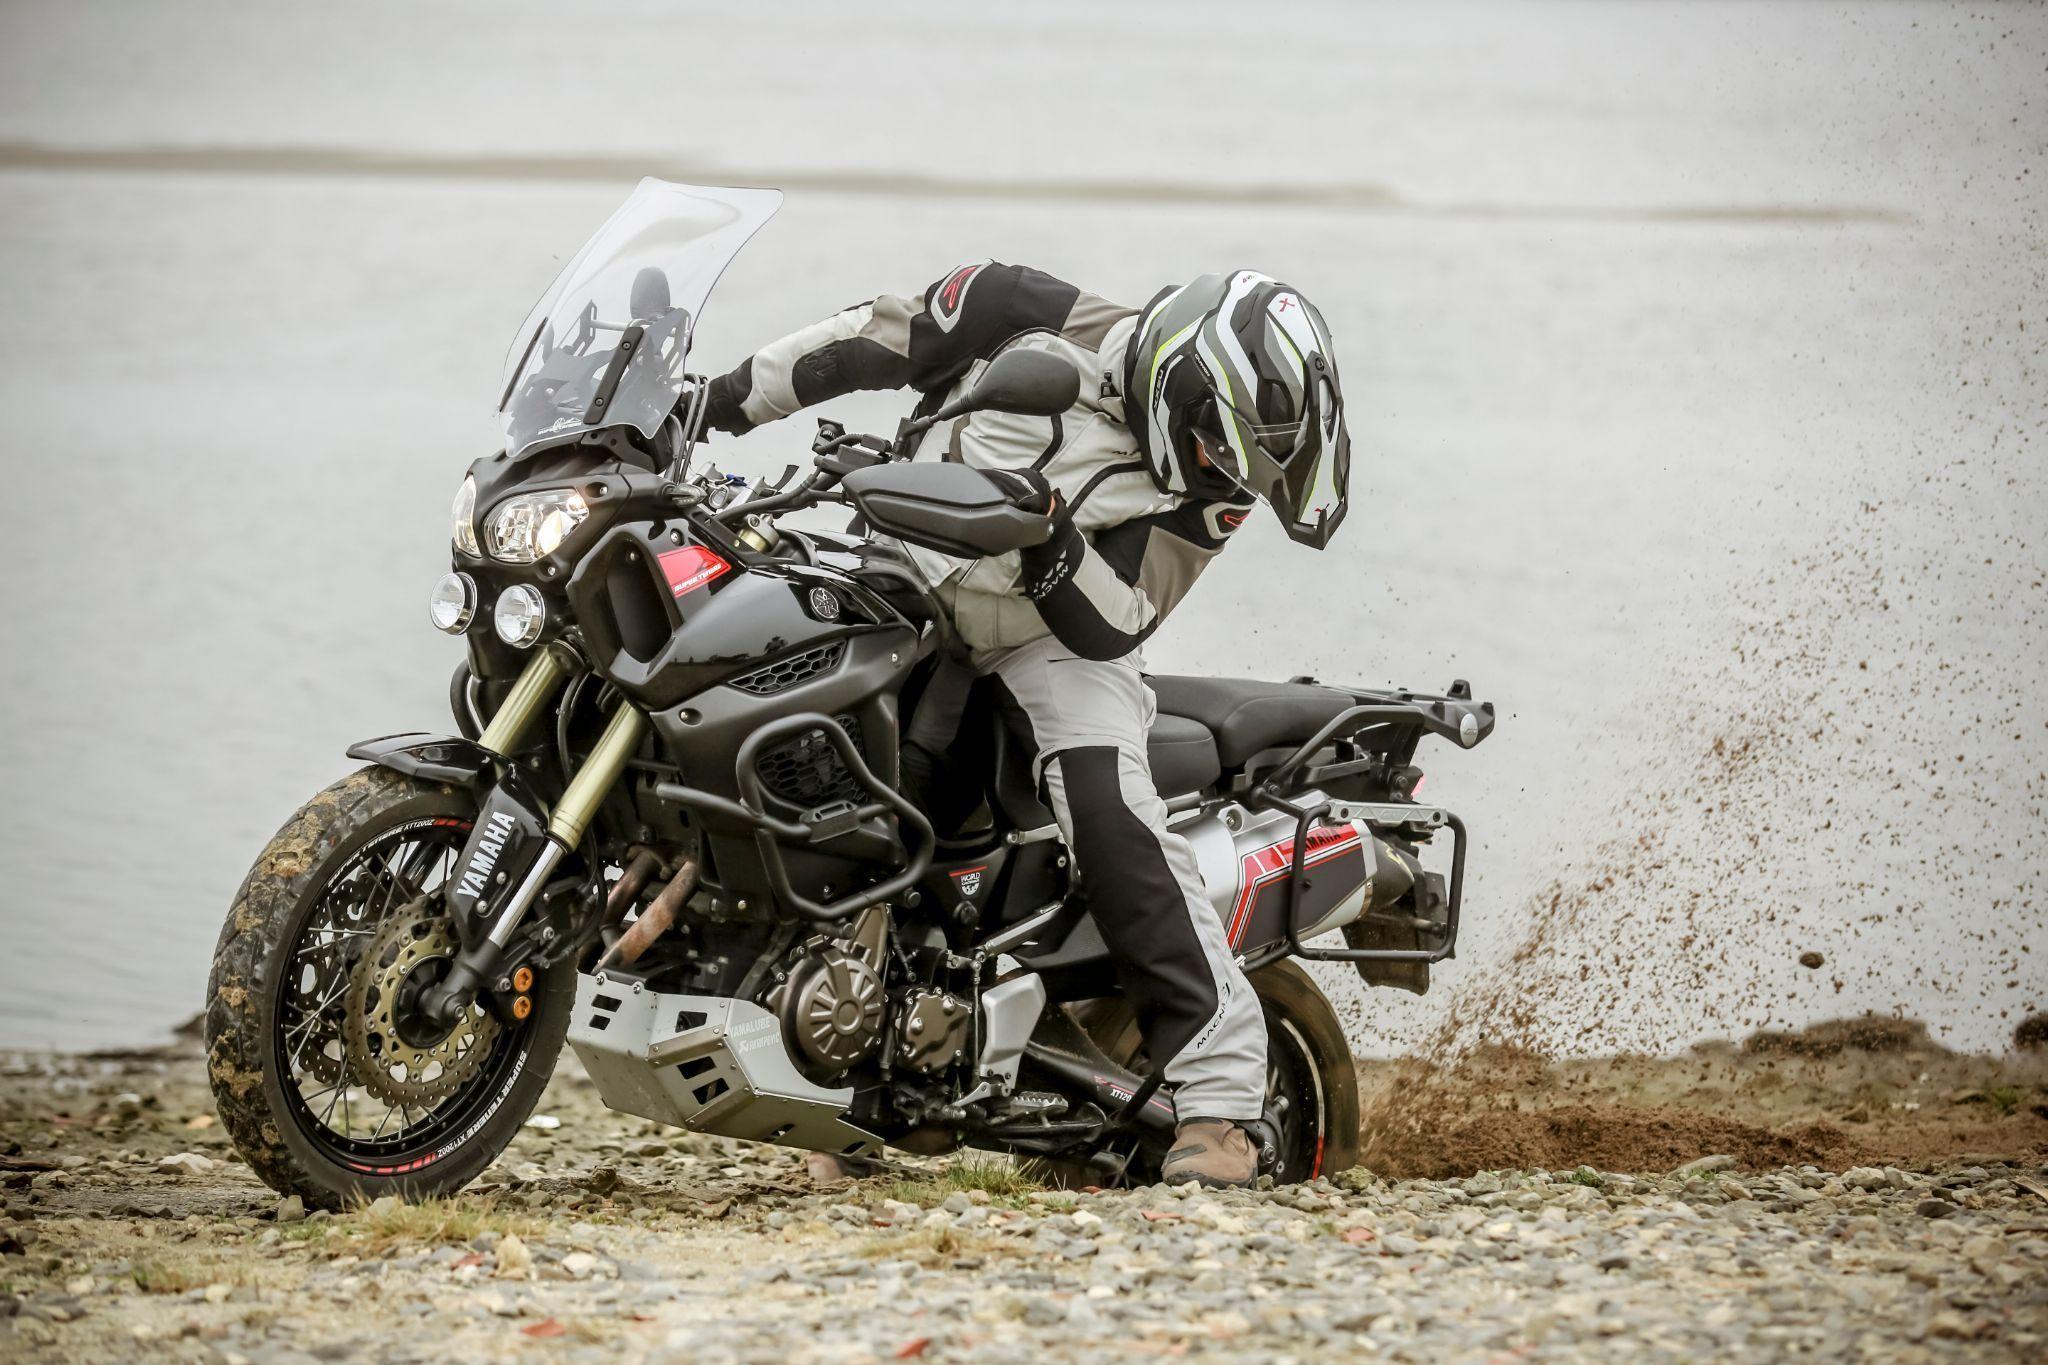 Vintage honda motorcycles, Honda gl, Honda motorcycles